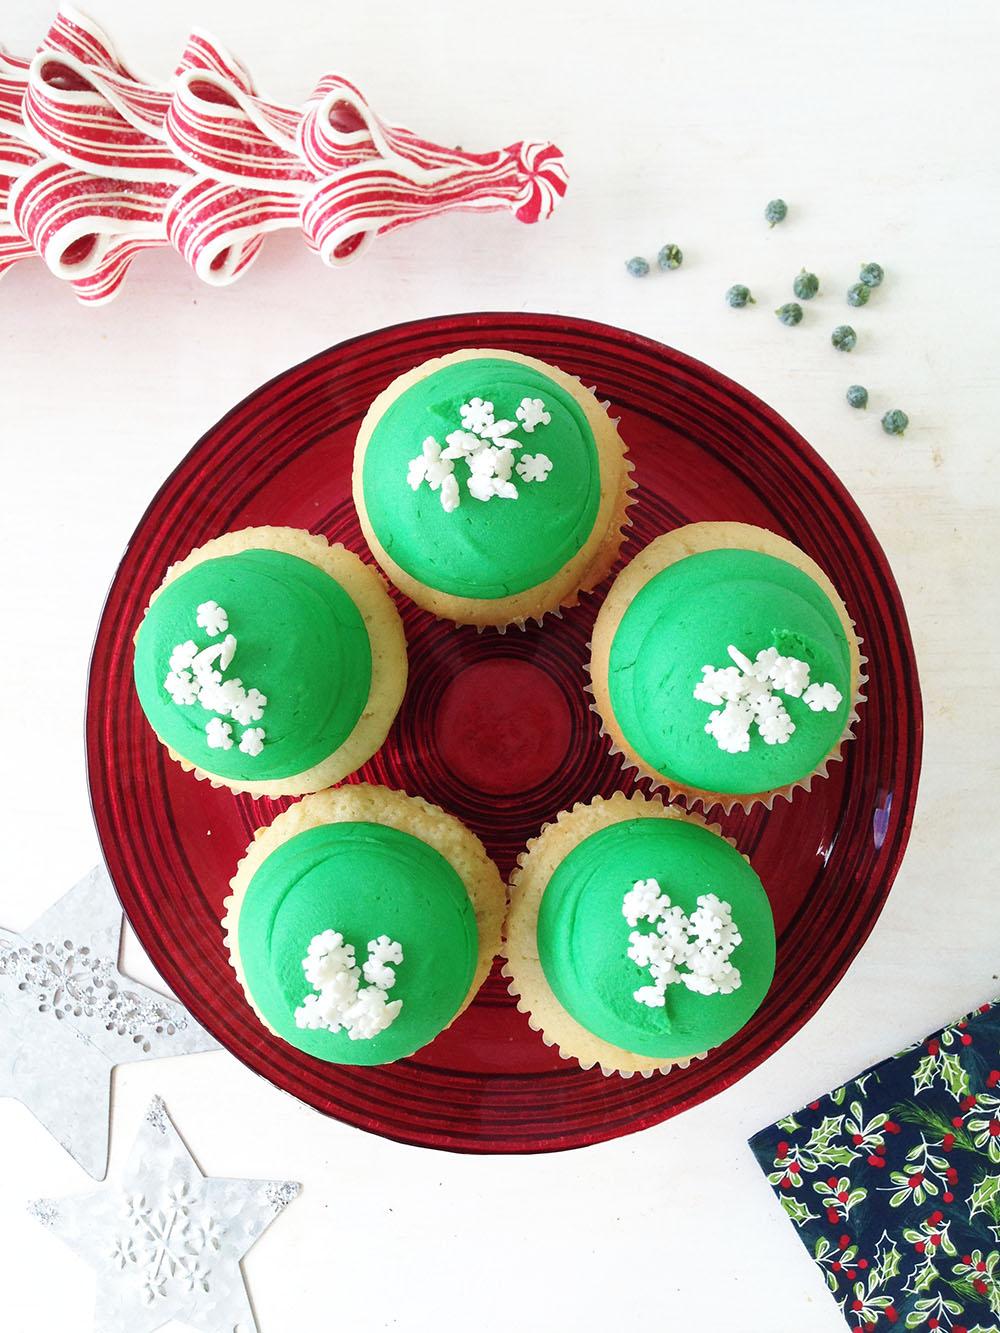 Vanilla Snowflake Cupcake - Regular $3.25